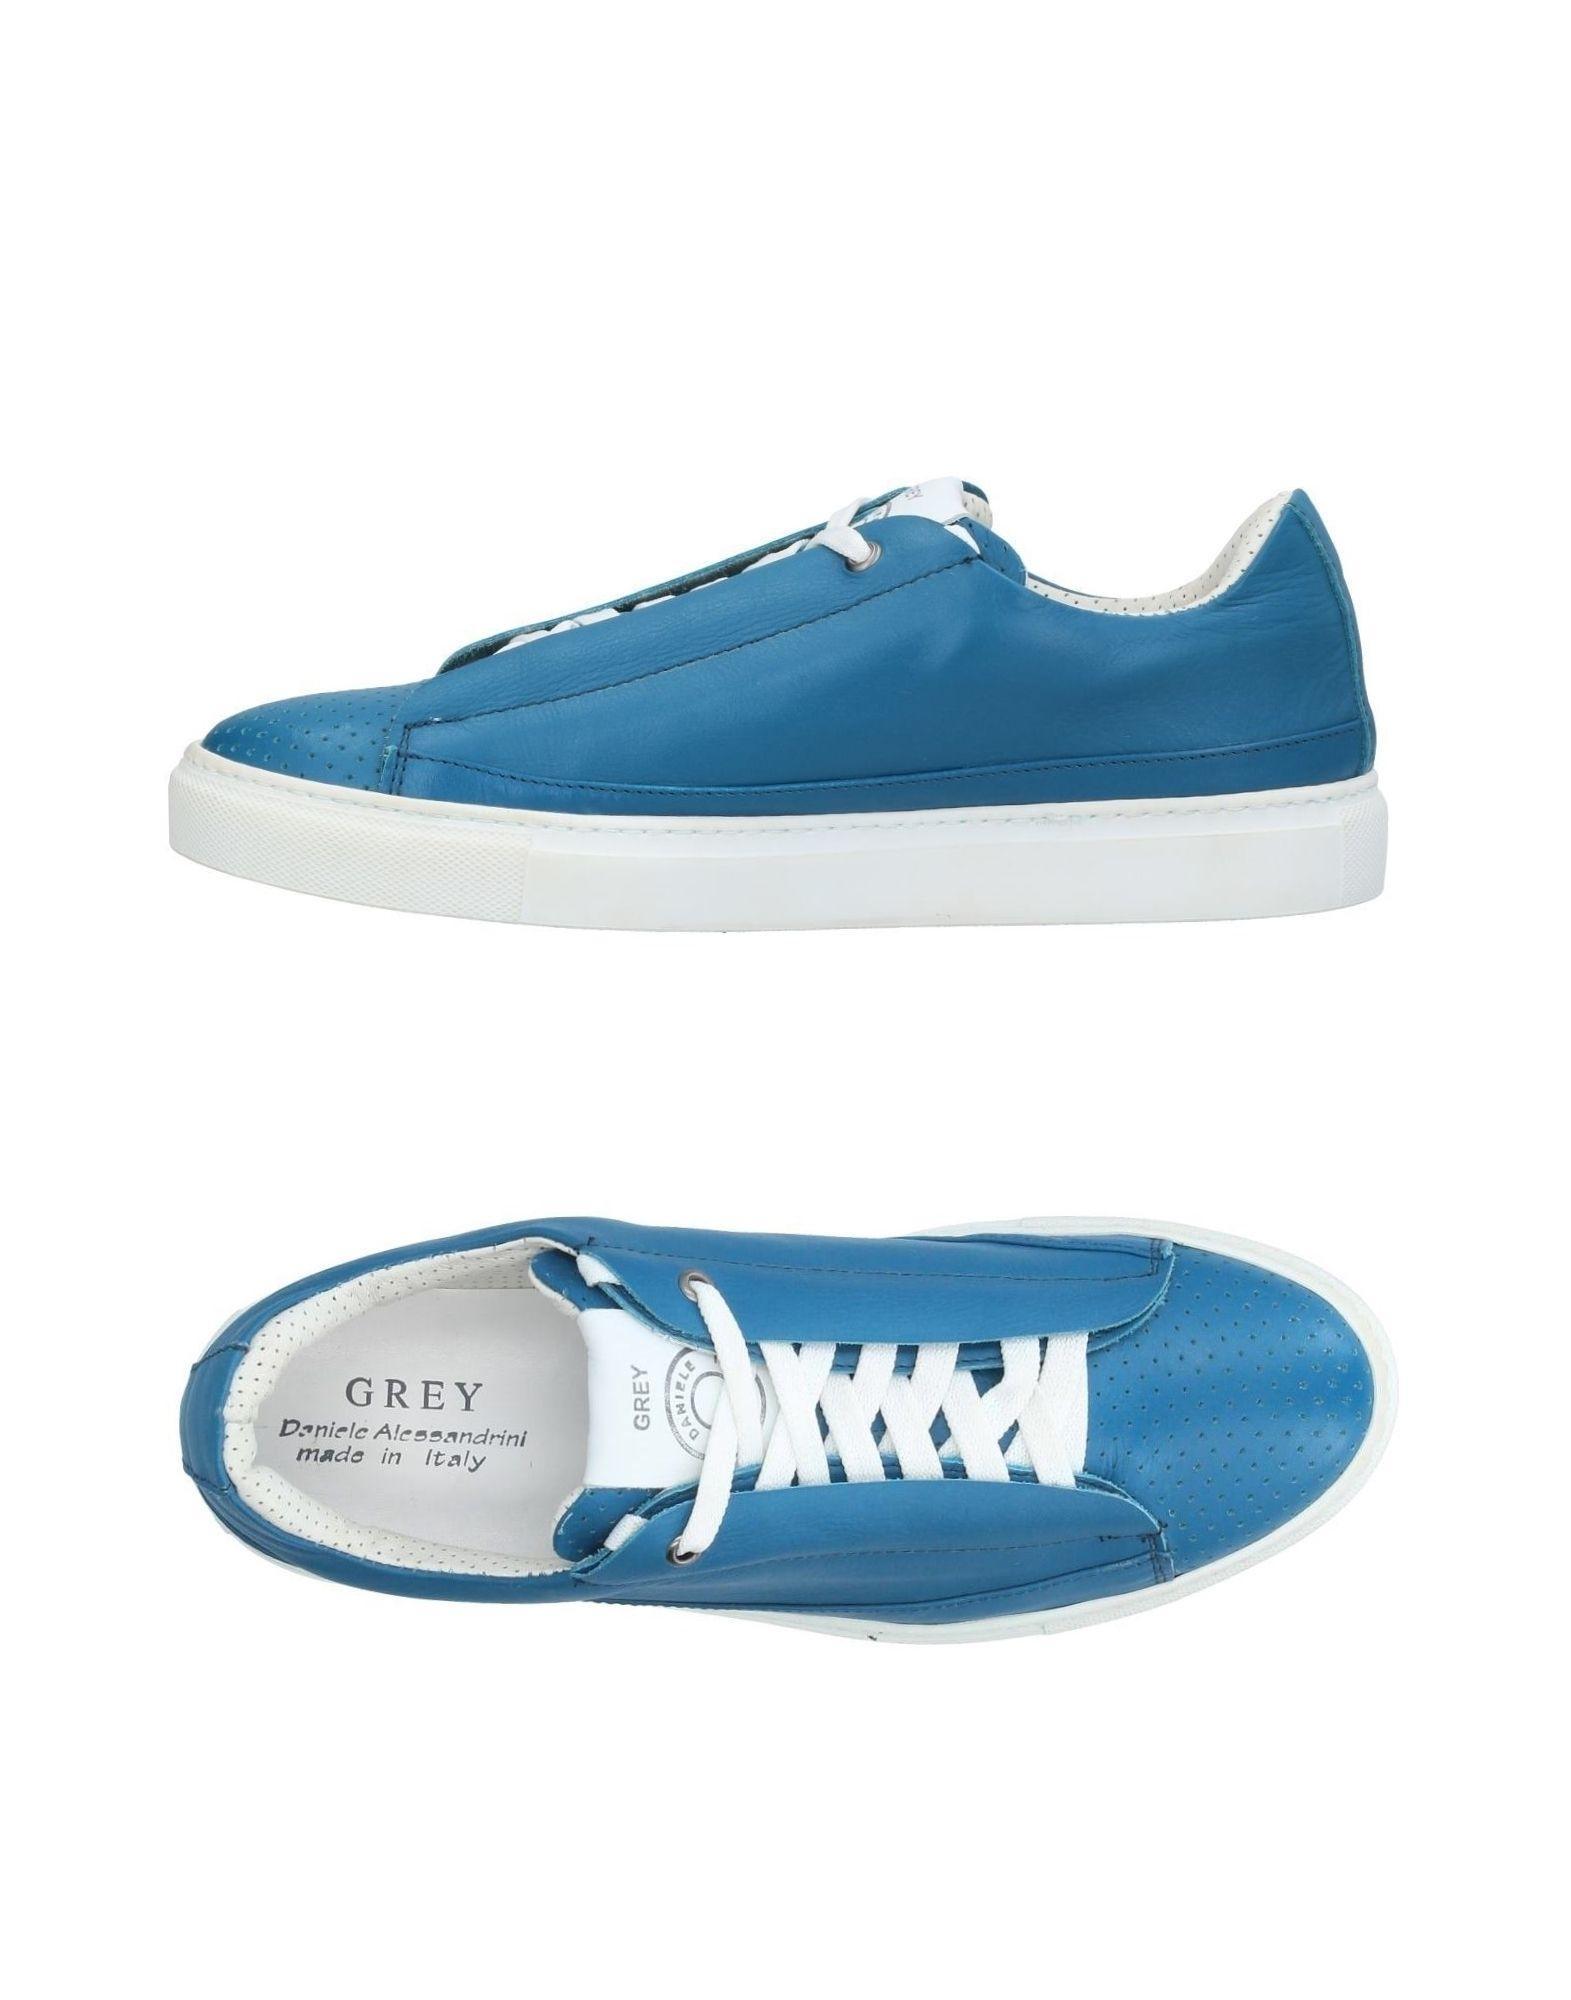 Grey Daniele Alessandrini Sneakers In Pastel Blue